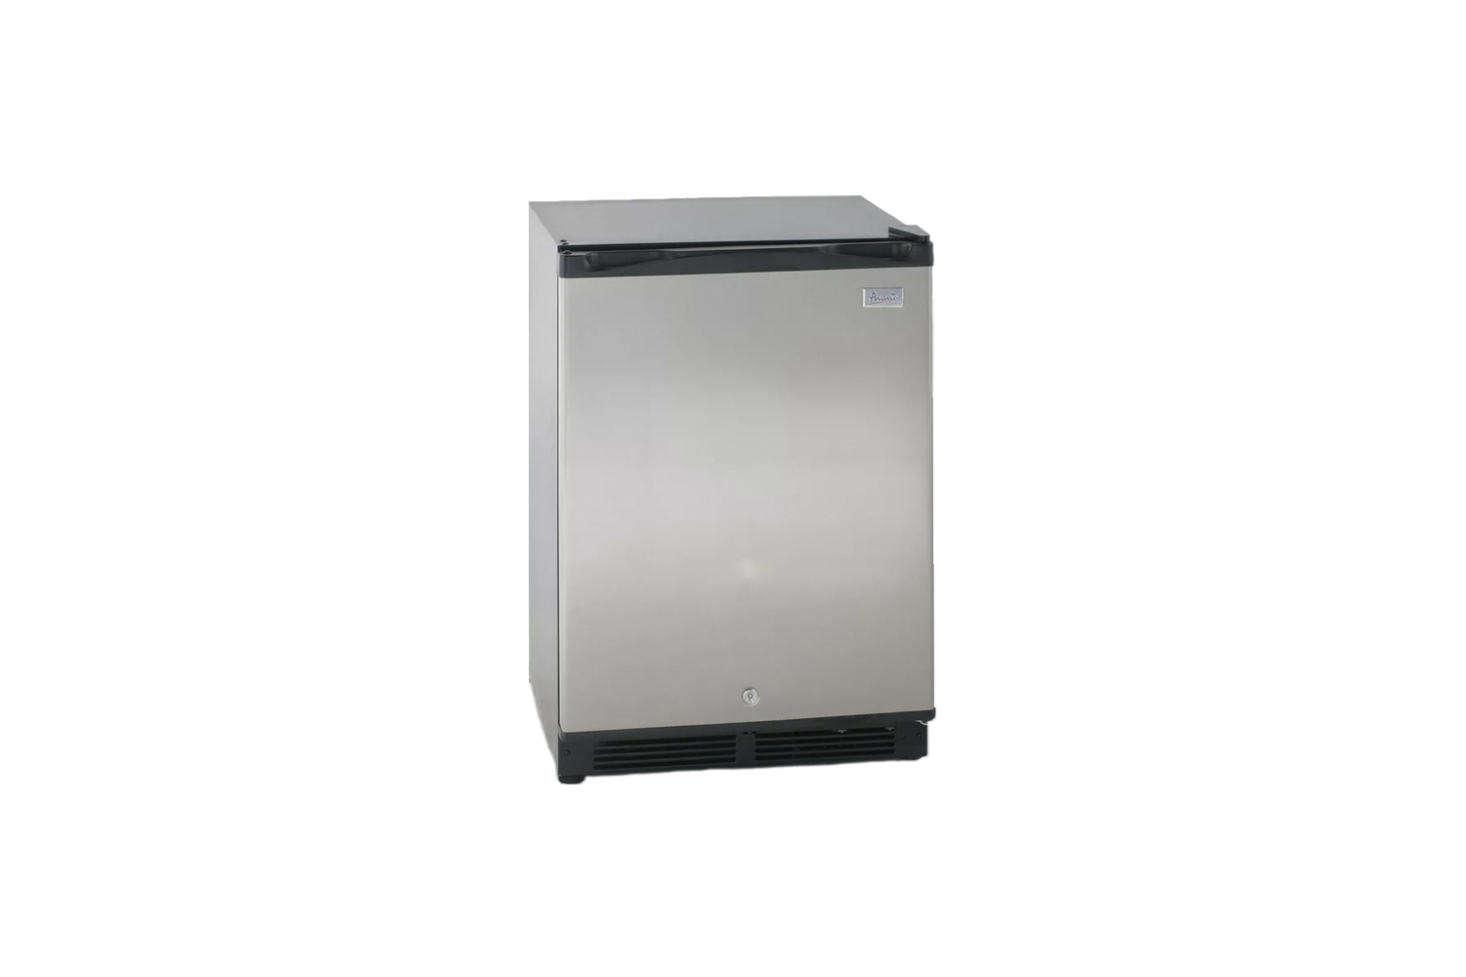 The Avanti  Inch Compact All Refrigerator is $305.7src=